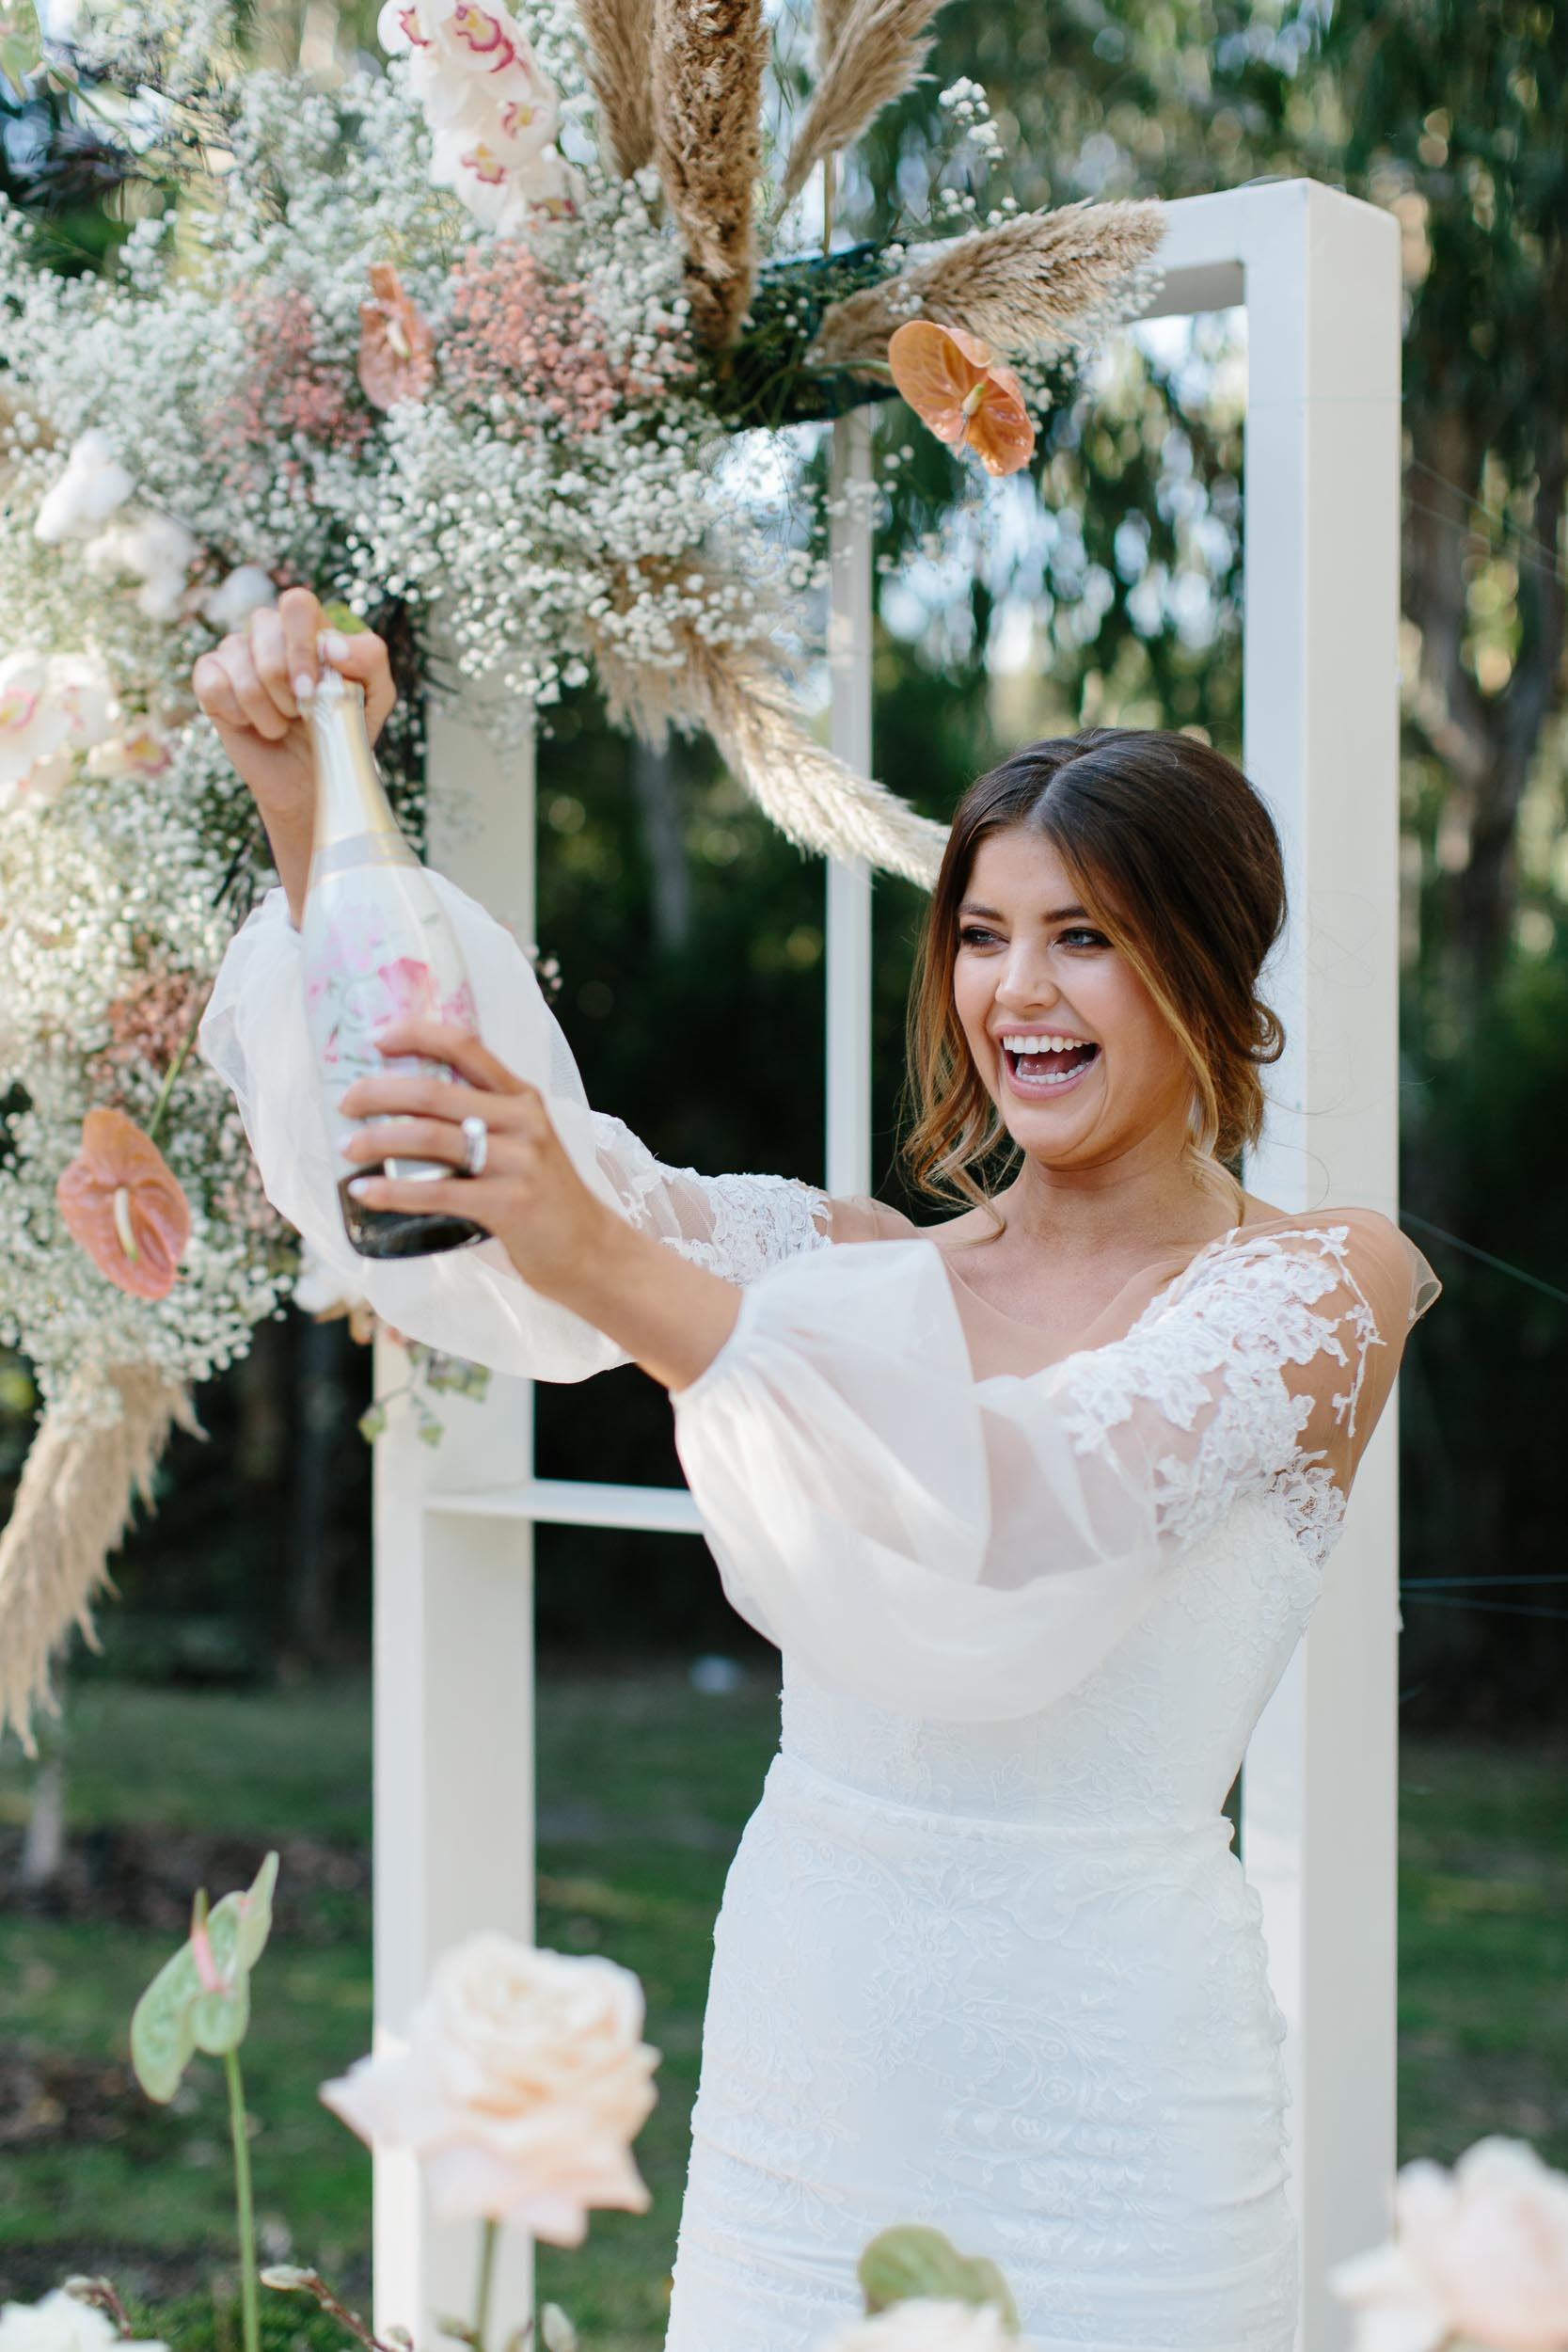 Kas-Richards-LENZO-Yarra-Valley-Wedding-One-Day-Bridal-285.jpg